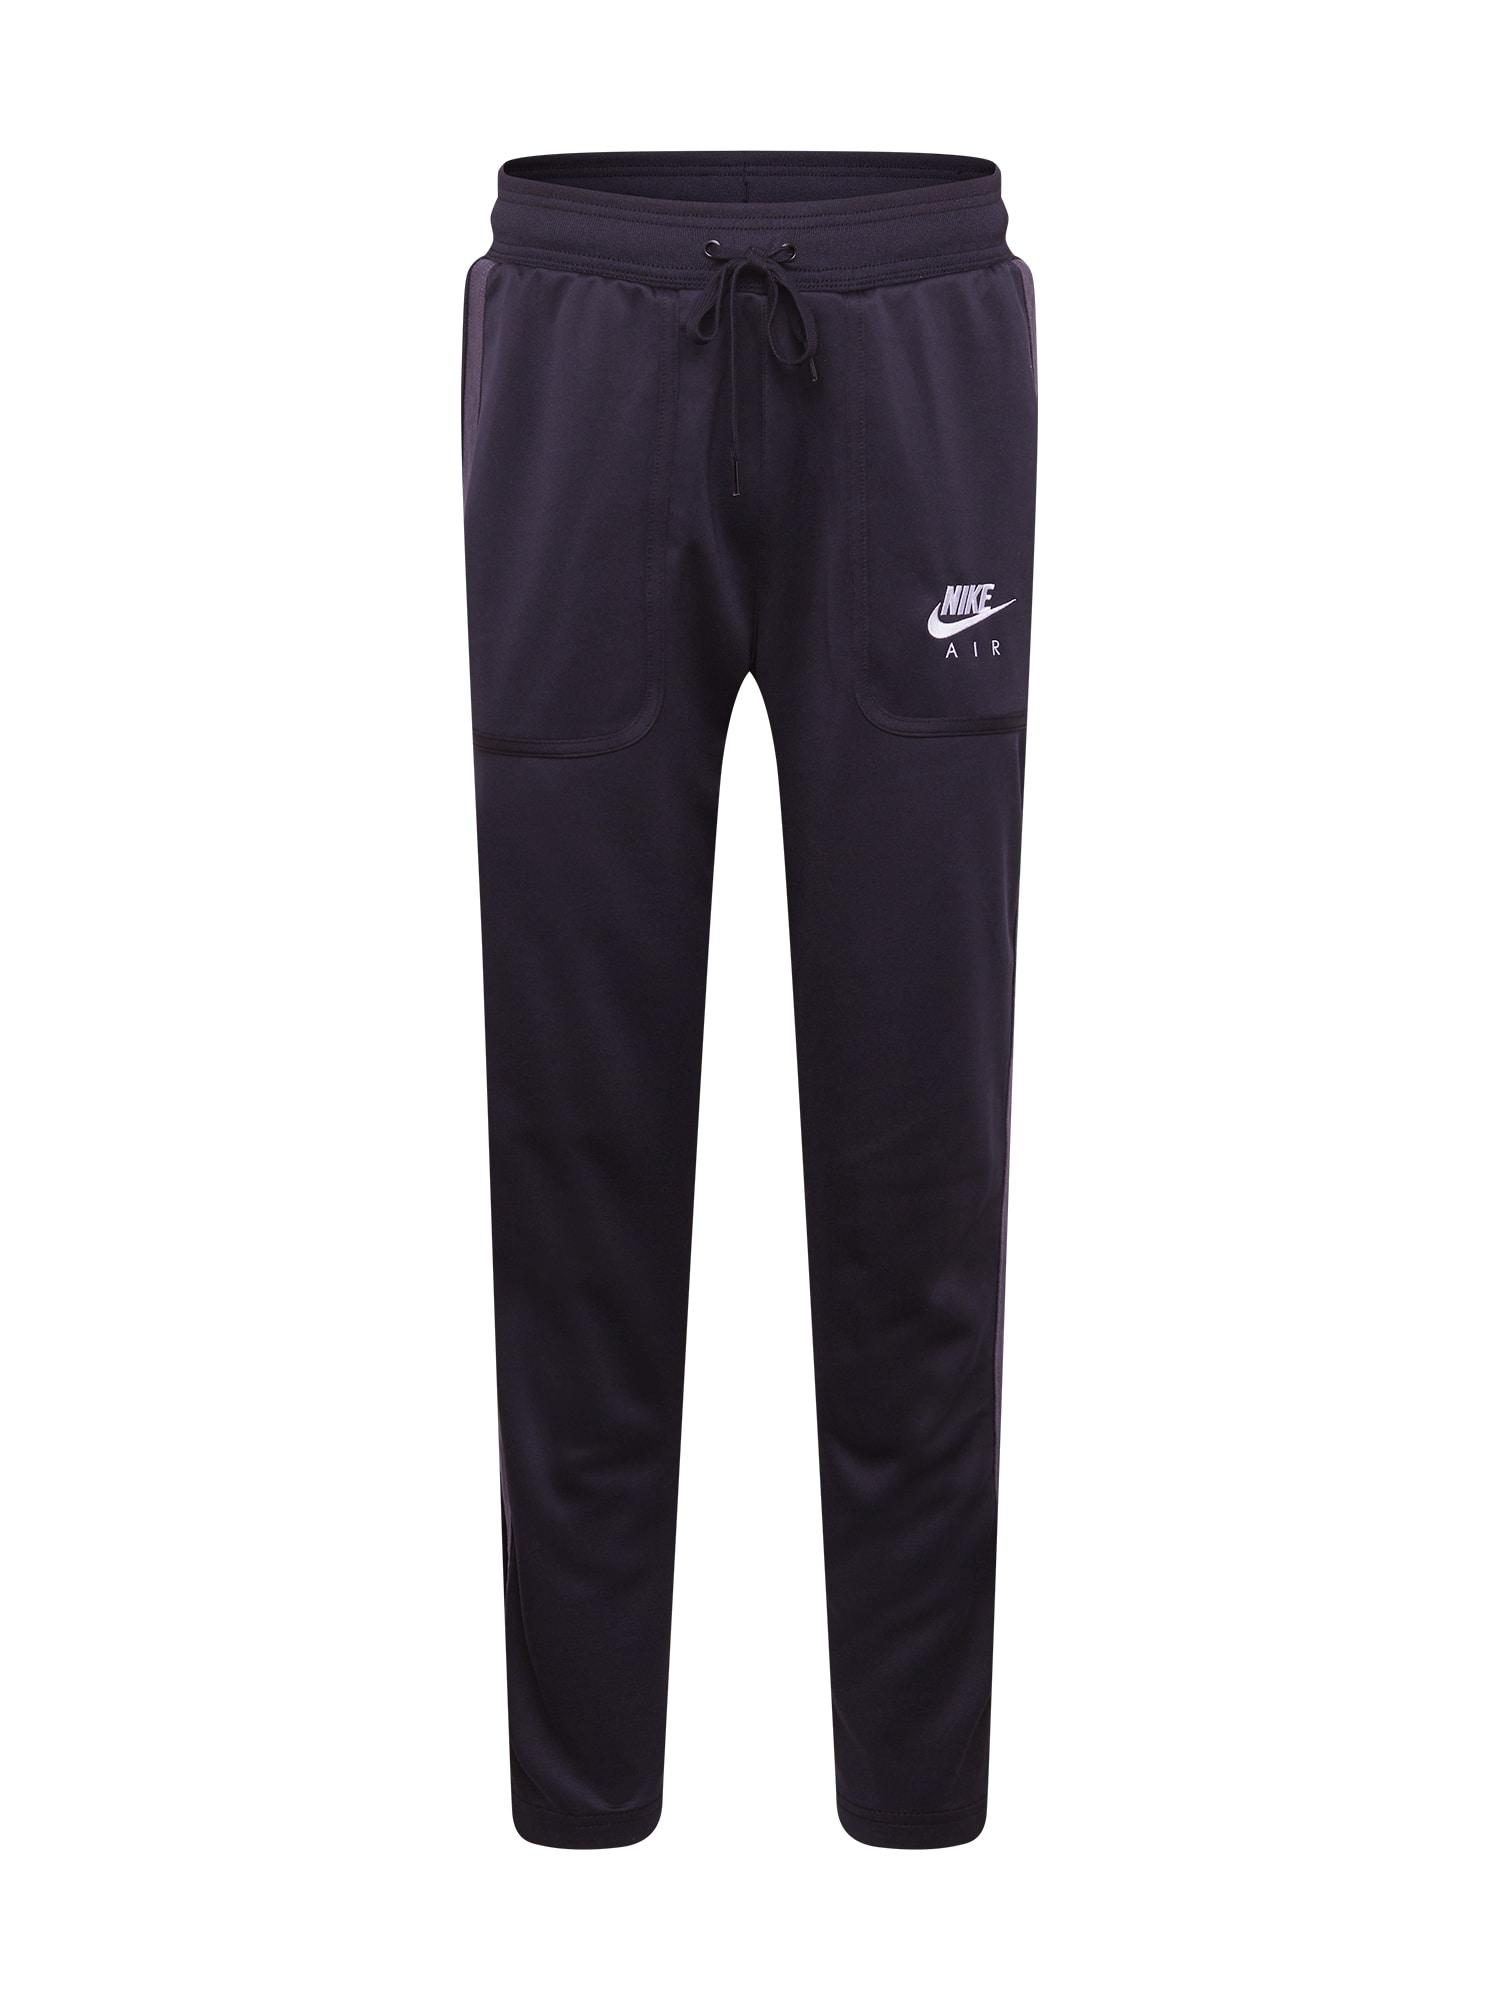 Nike Sportswear Kelnės juoda / balta / grafito